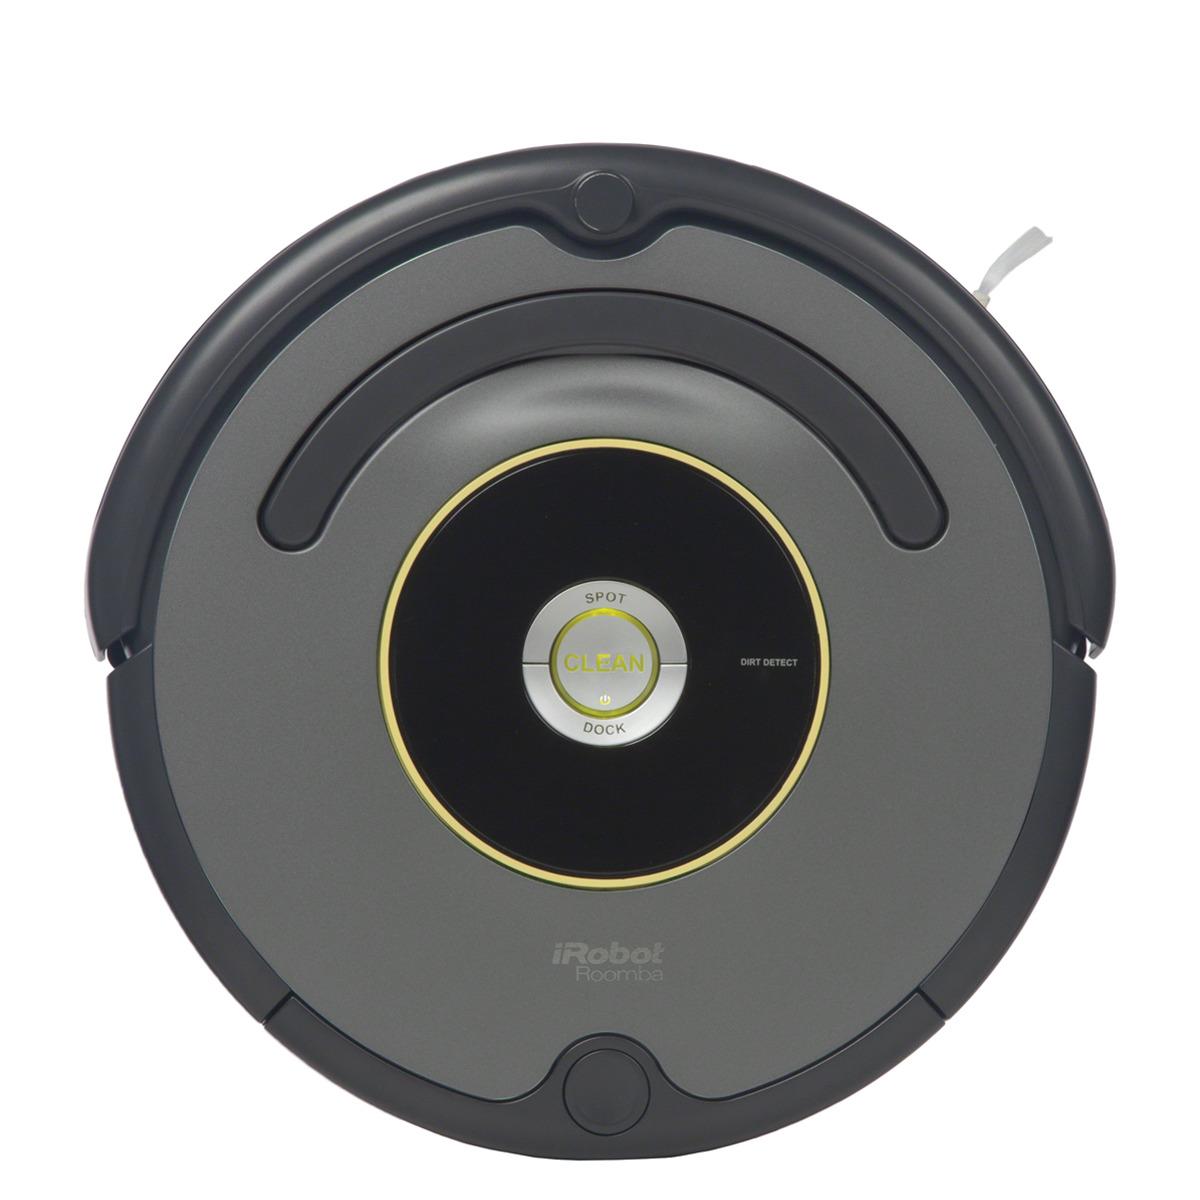 Robot aspirador iRobot Roomba 632